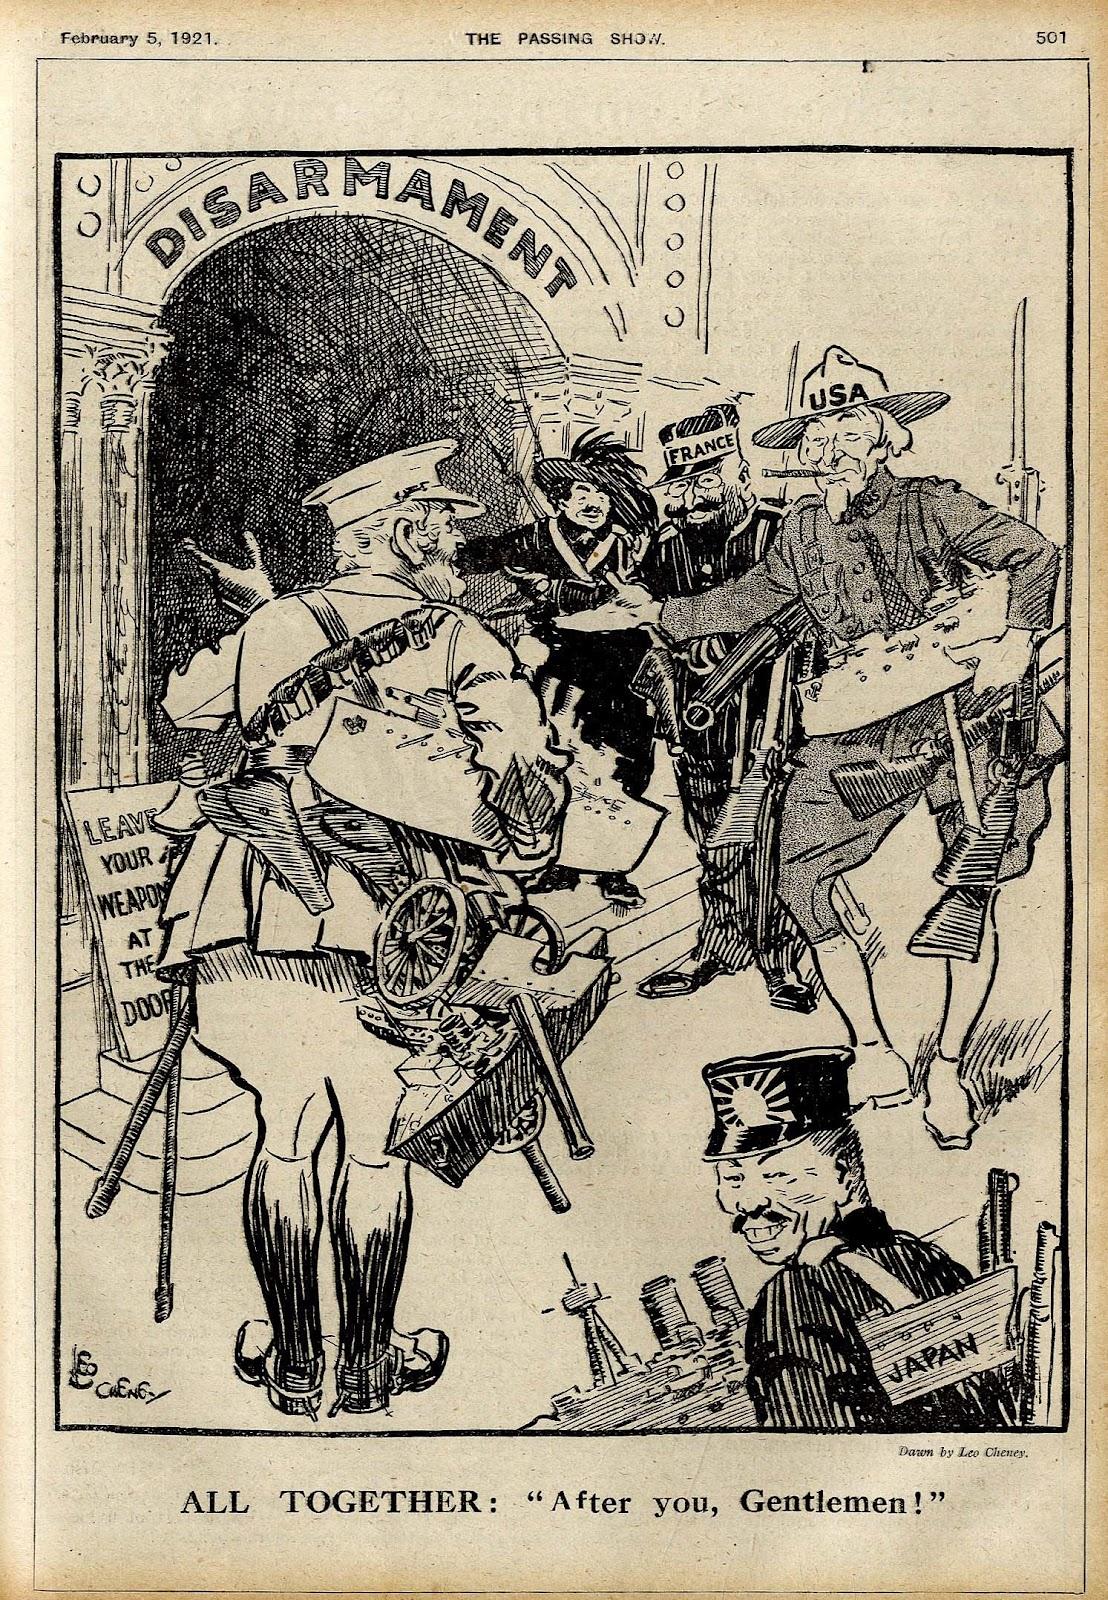 Cartoon Cliche Primer: After you, Gentlemen (Disarmament) 1921